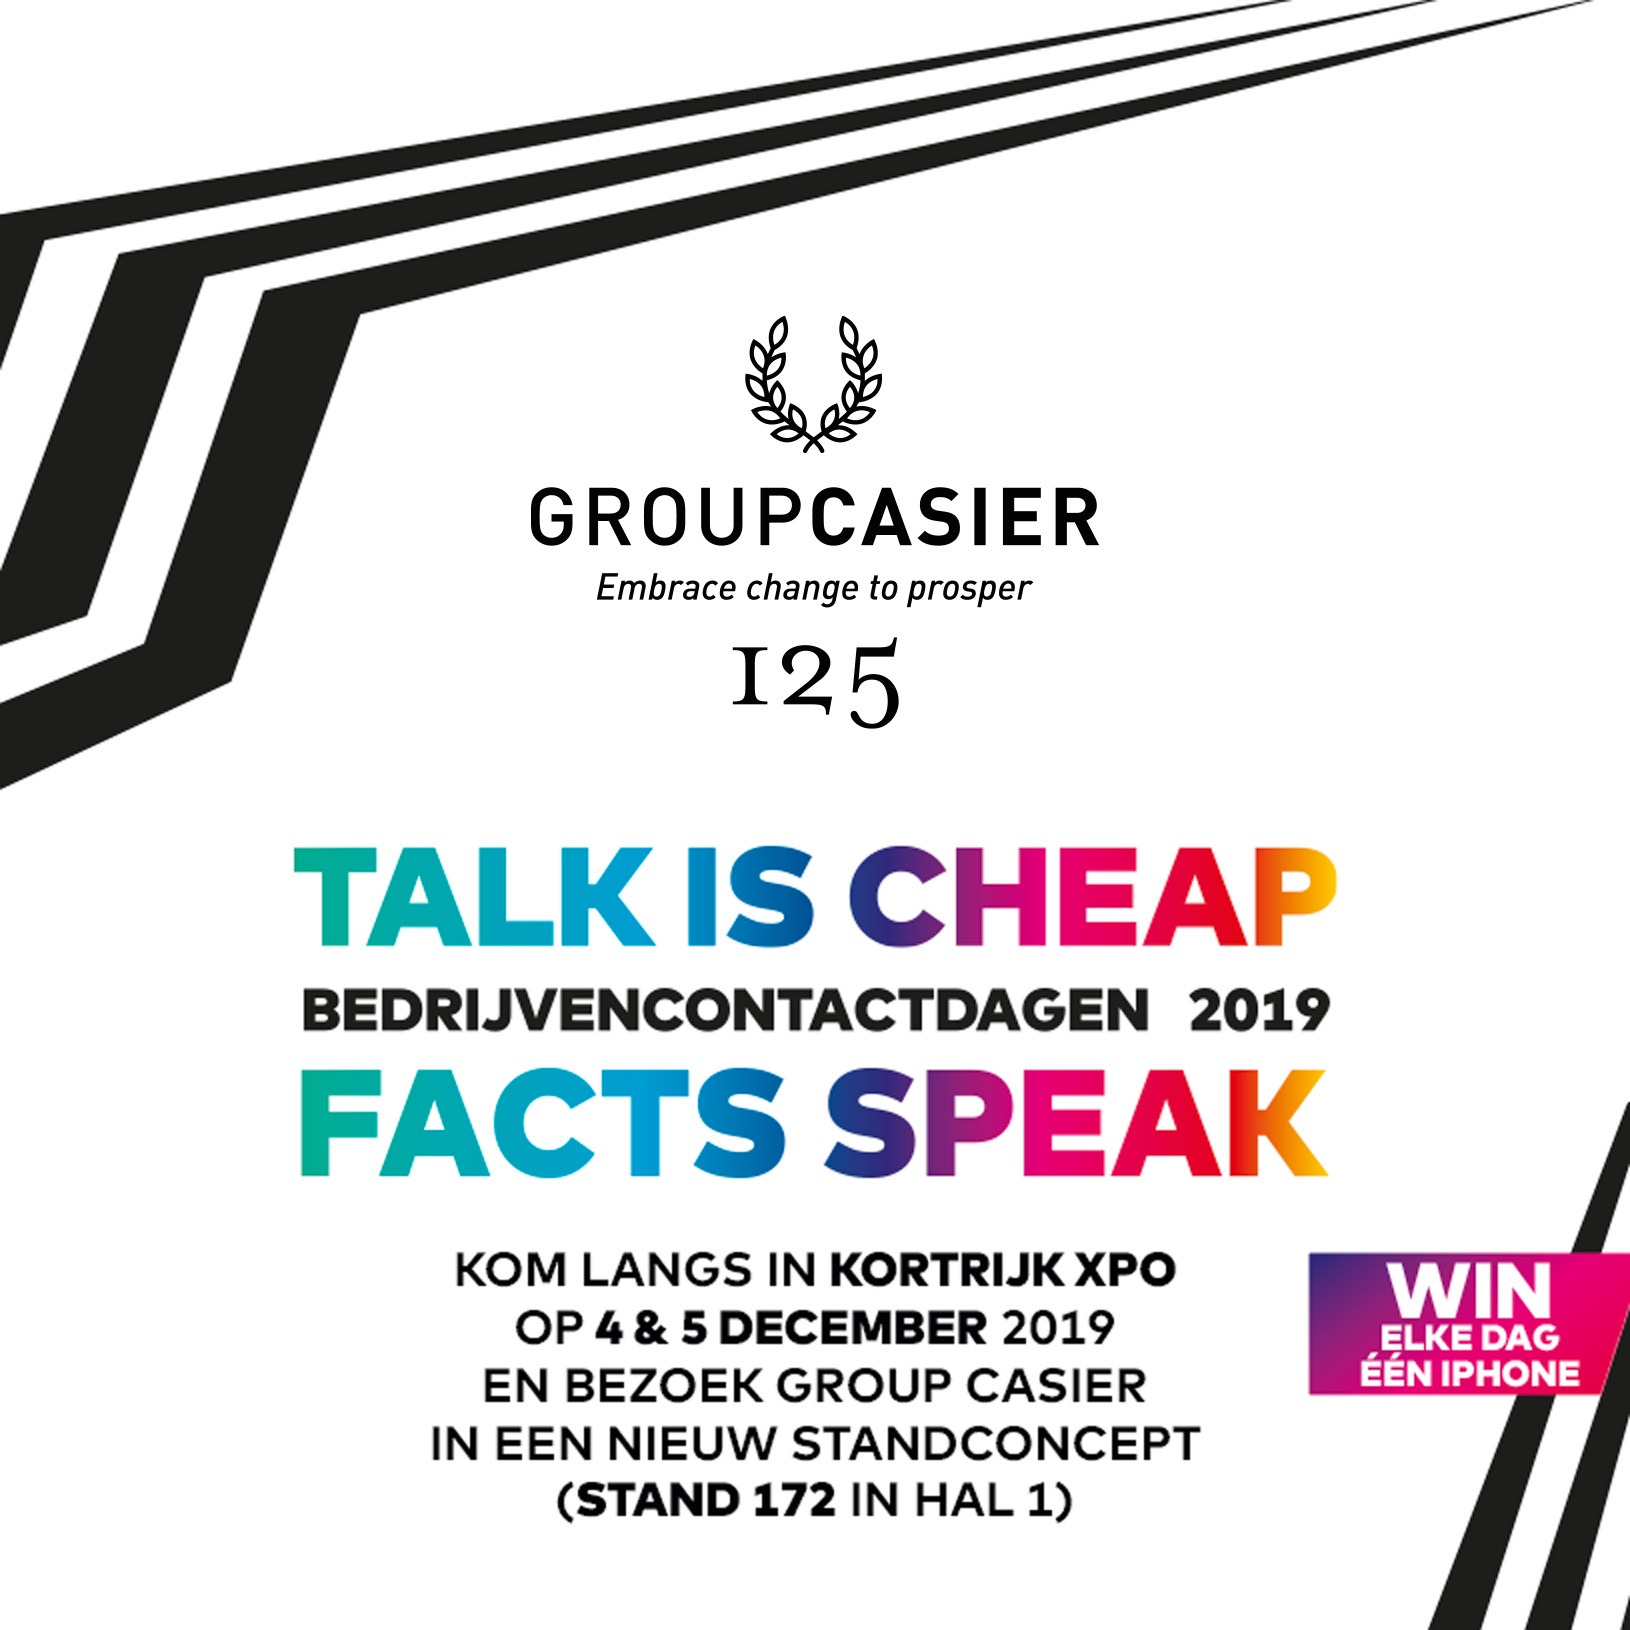 Talk is Cheap Facts Speak